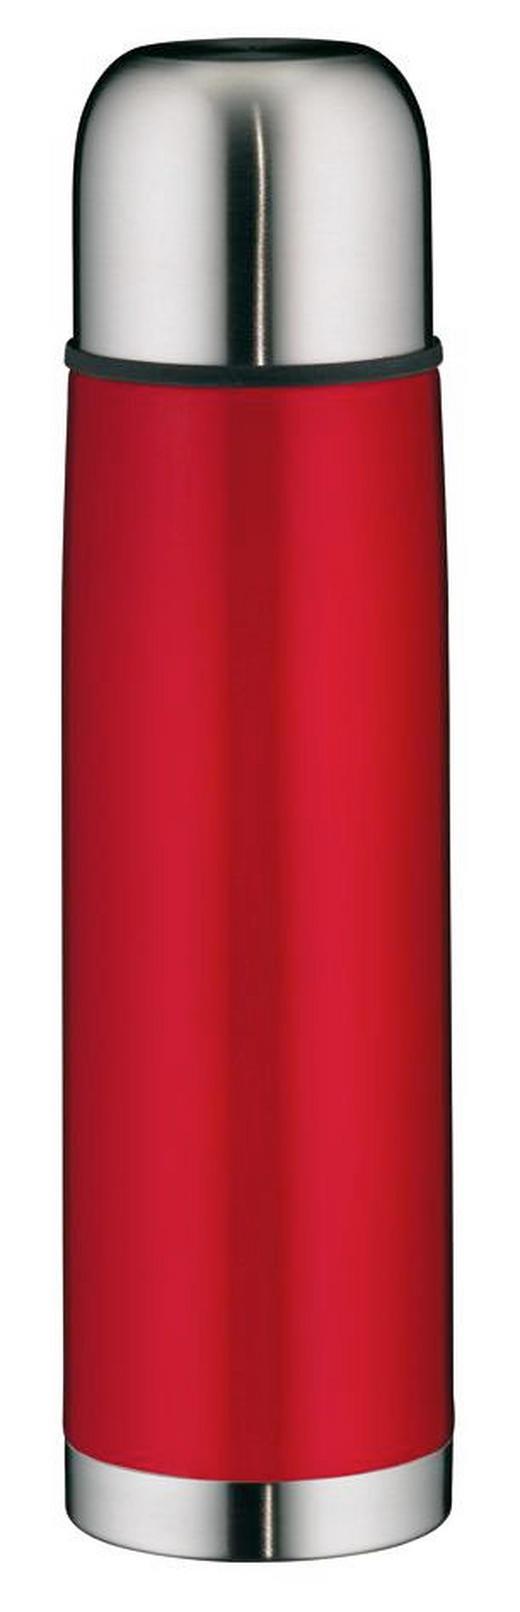 ISOLIERFLASCHE 0,75 L - Edelstahlfarben, Basics, Metall (0,75l) - Alfi